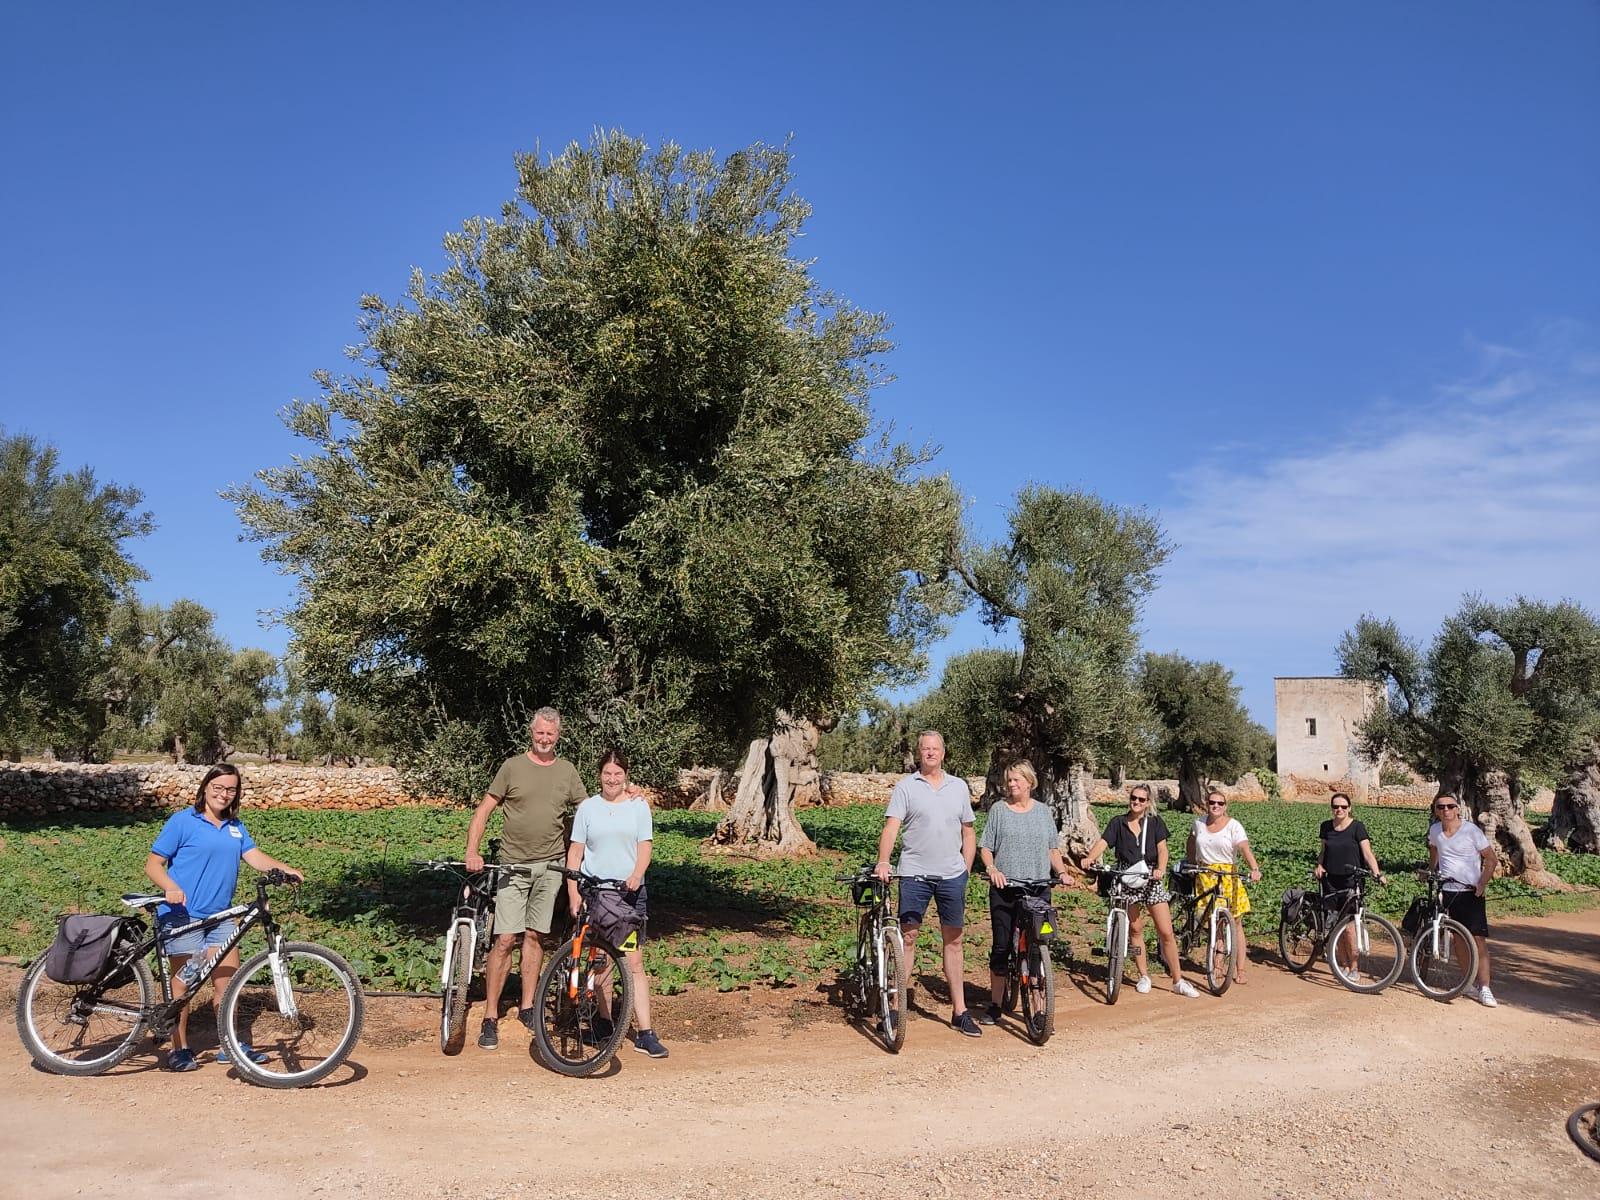 Bike tour tra ulivi millenari, frantoi e masserie fortificate